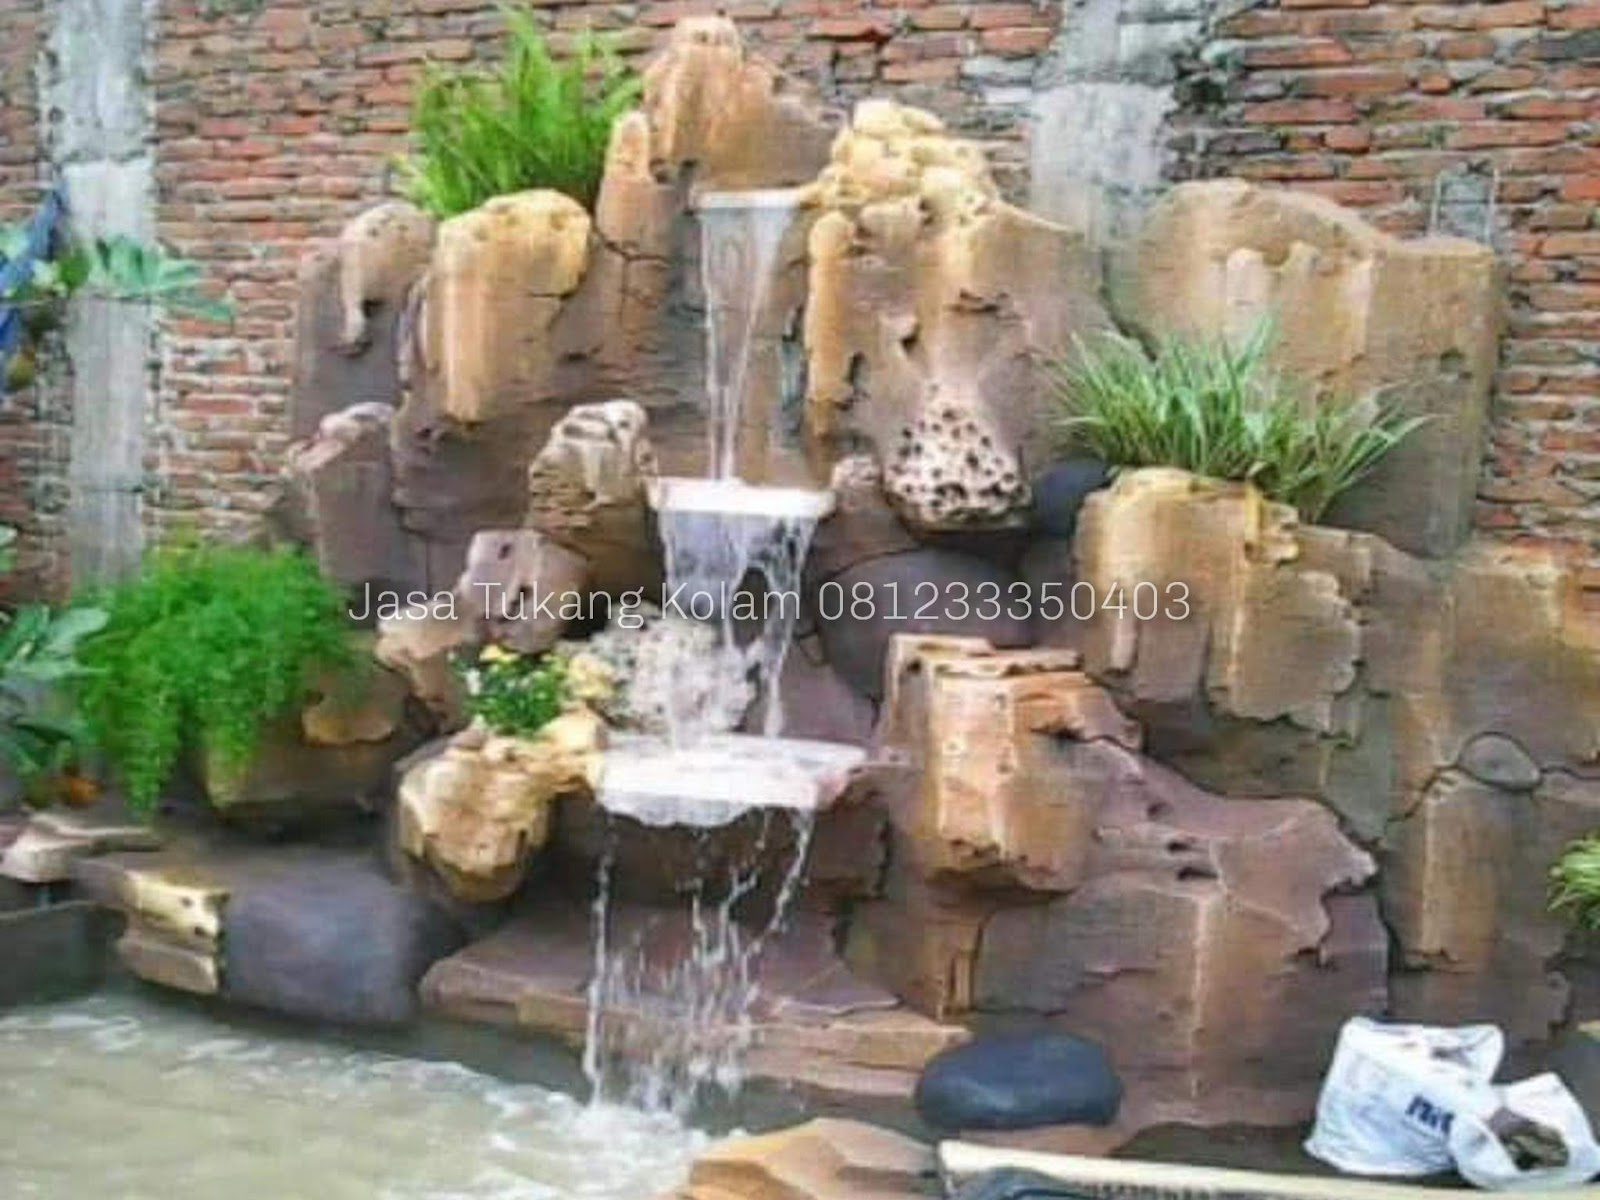 Jasa Pembuatan Kolam Dekorasi Tebing Air Terjun Dan Air Mancur Di Malang Jasa Pembuatan Taman Air terjun dinding minimalis